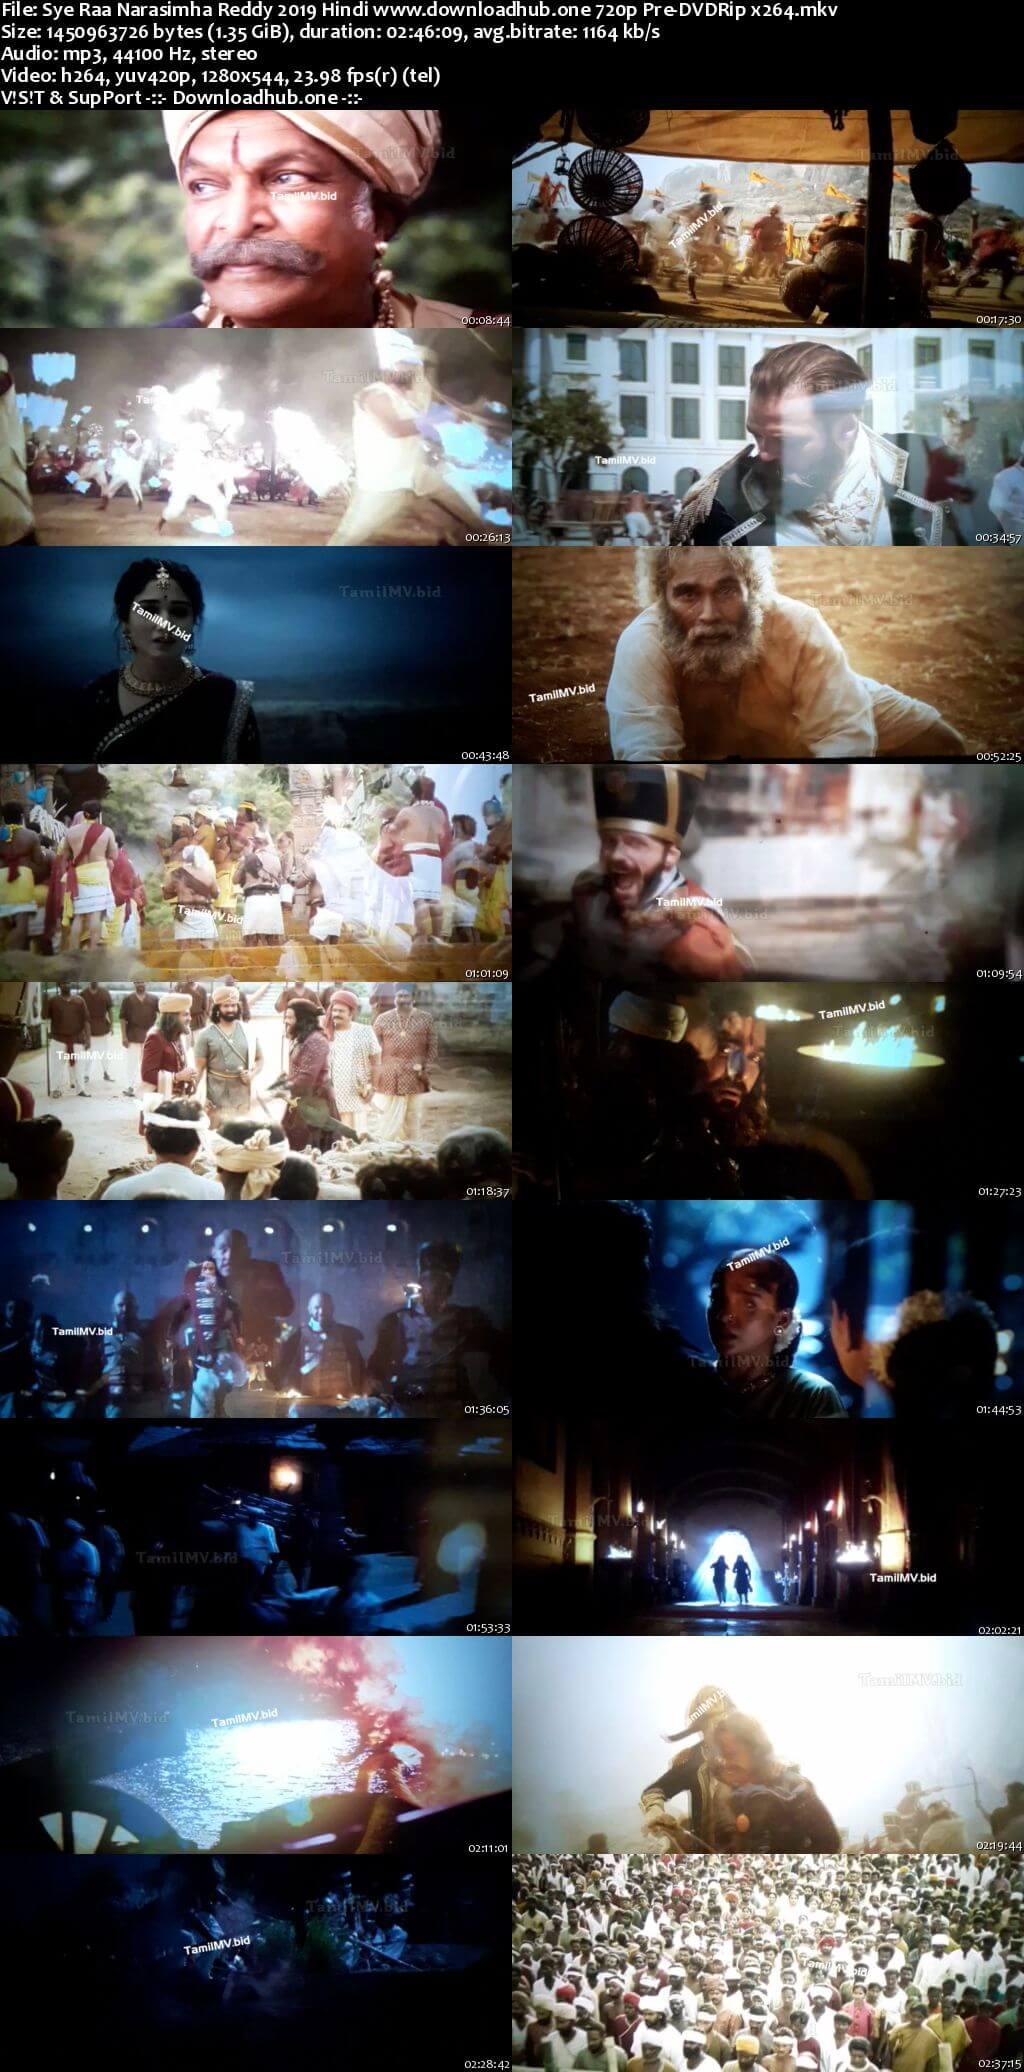 Sye Raa Narasimha Reddy 2019 Hindi 720p Pre-DVDRip x264